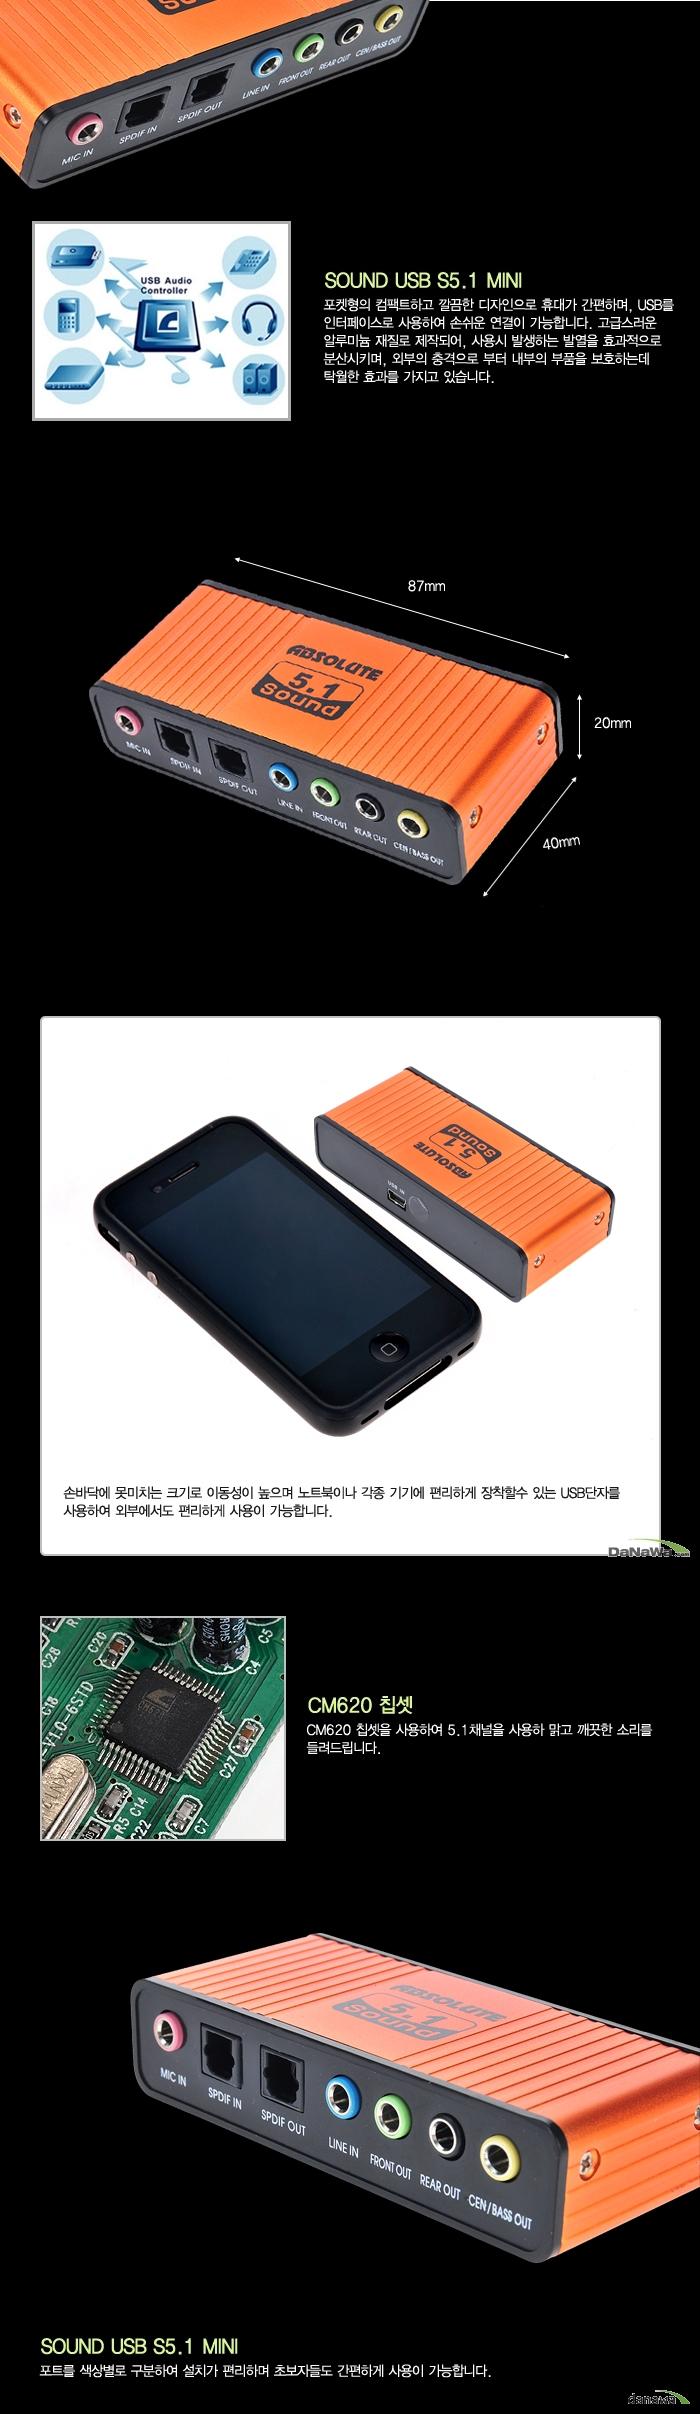 ABKO 앱코 SOUND USB S5.1 MINI 제품 정측면 이미지 및 스마트폰과 크기 비교 이미지 및 사이즈 측정, 제품 설명